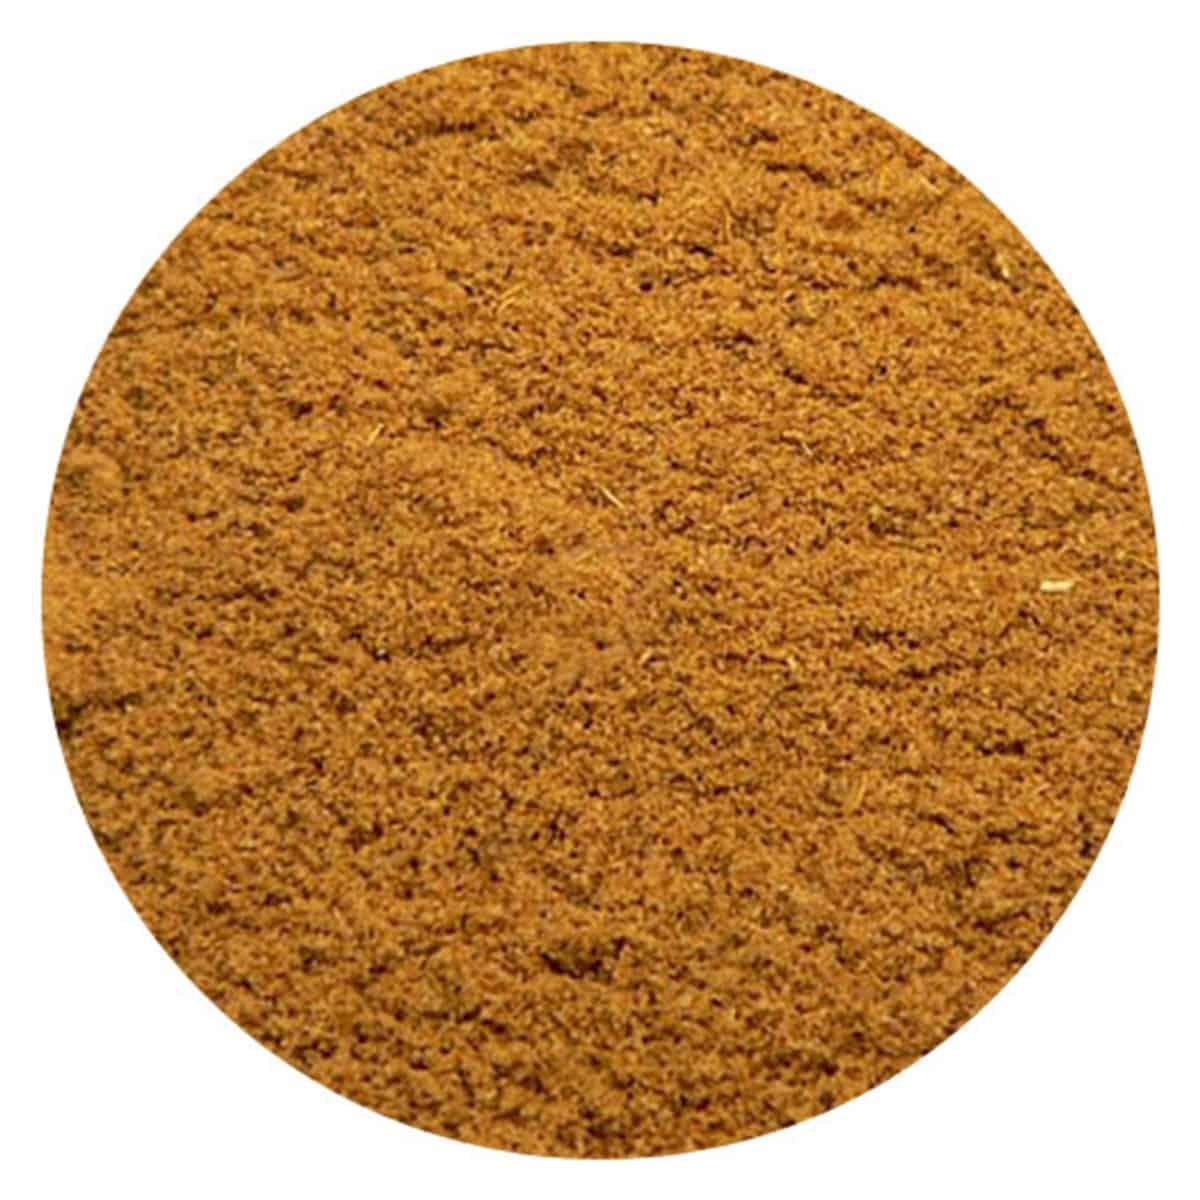 Buy IAG Foods Cumin Powder - 1 kg